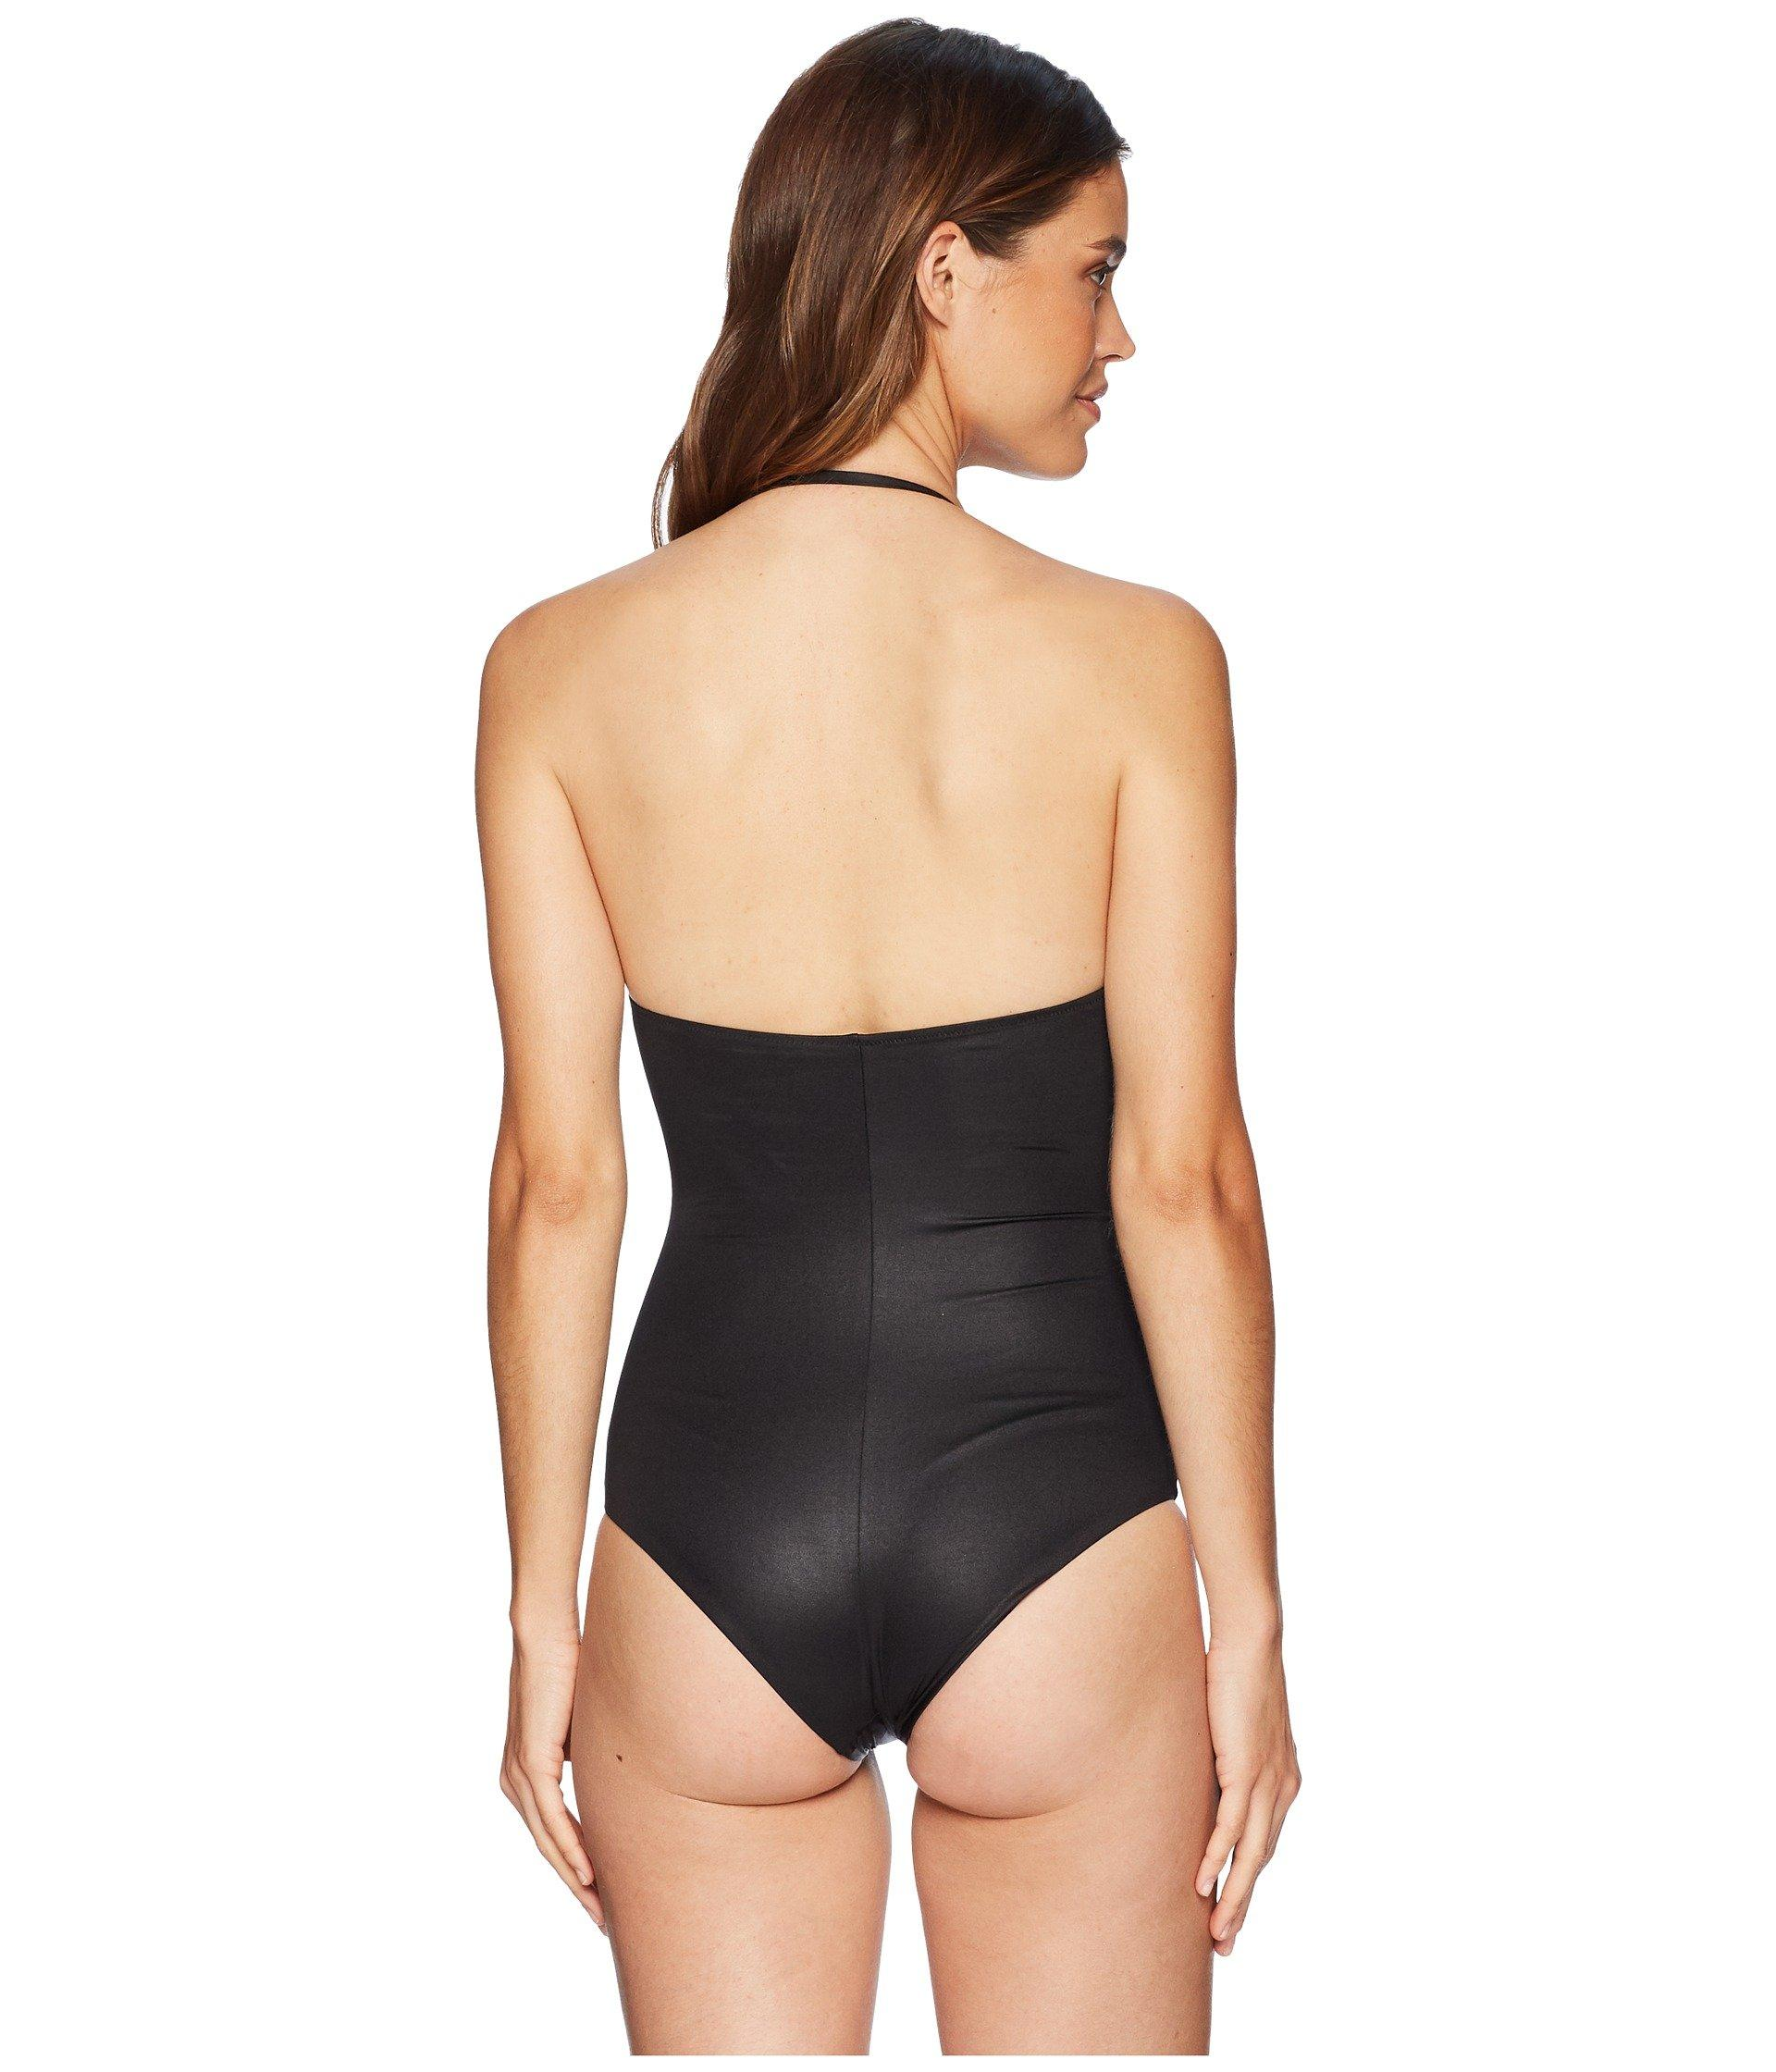 2bbe11eb73f3d Versace - Black Intero Elastic Gold Medusa Maillot One-piece Swimsuit -  Lyst. View fullscreen